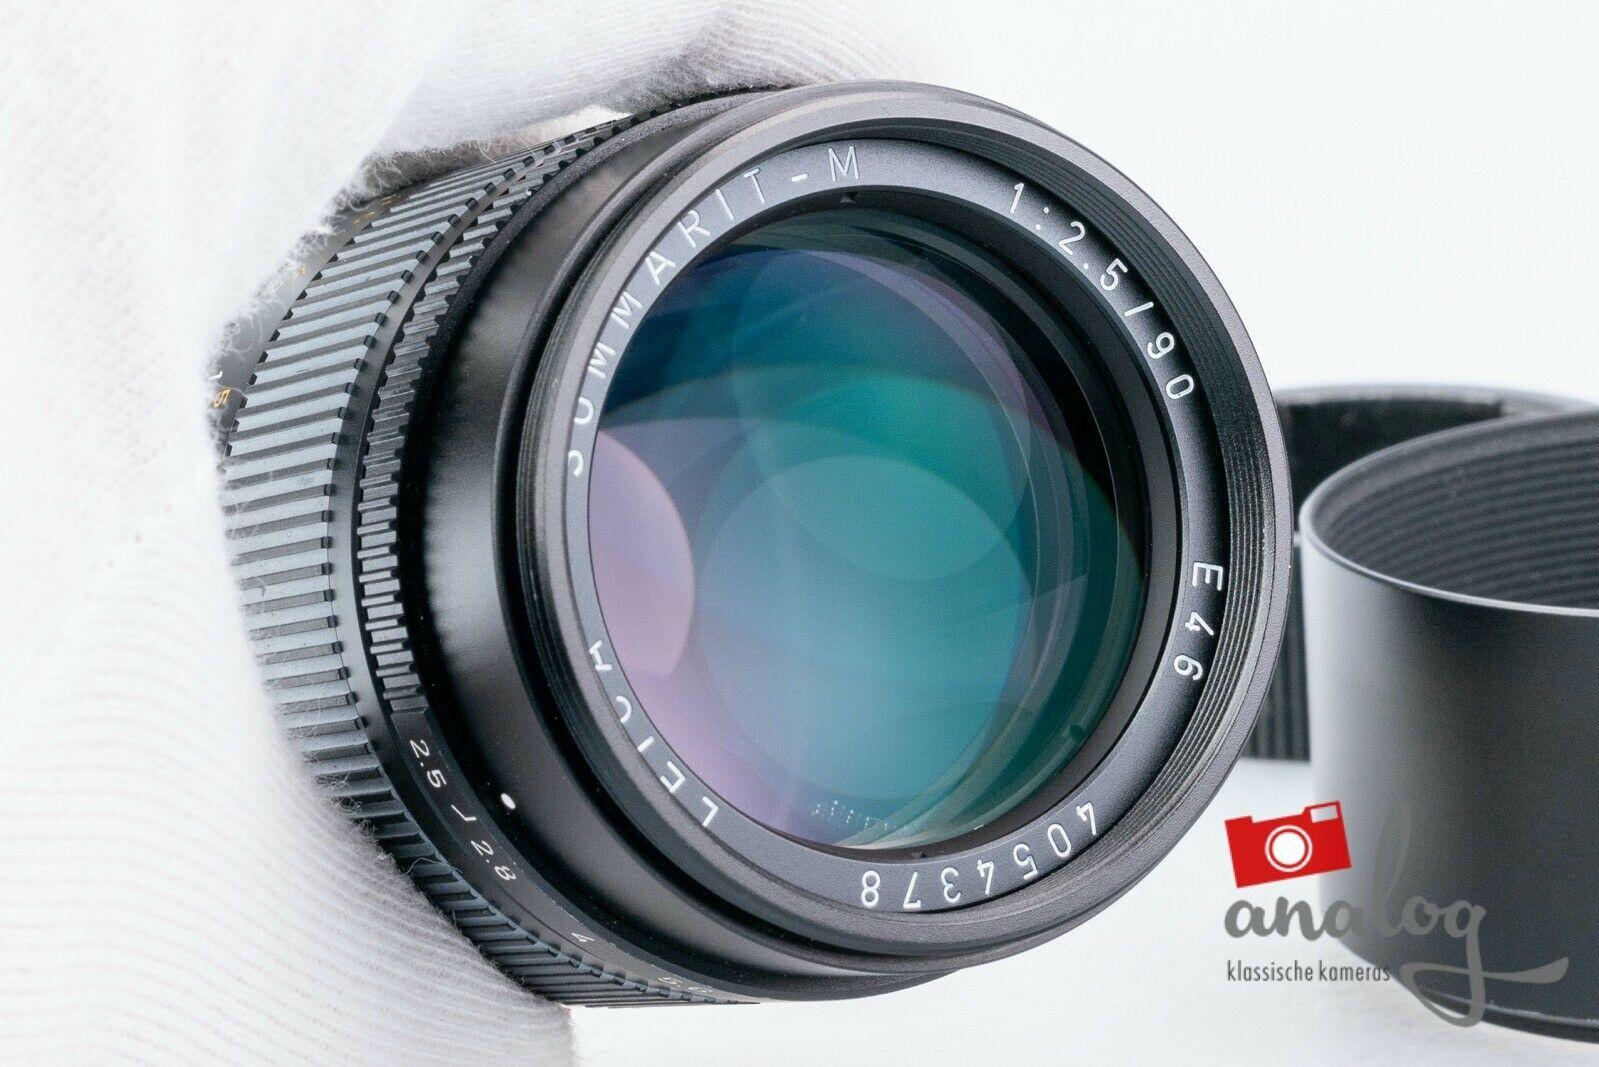 Leica Summarit-M 90mm 2.5 E46 - 11646